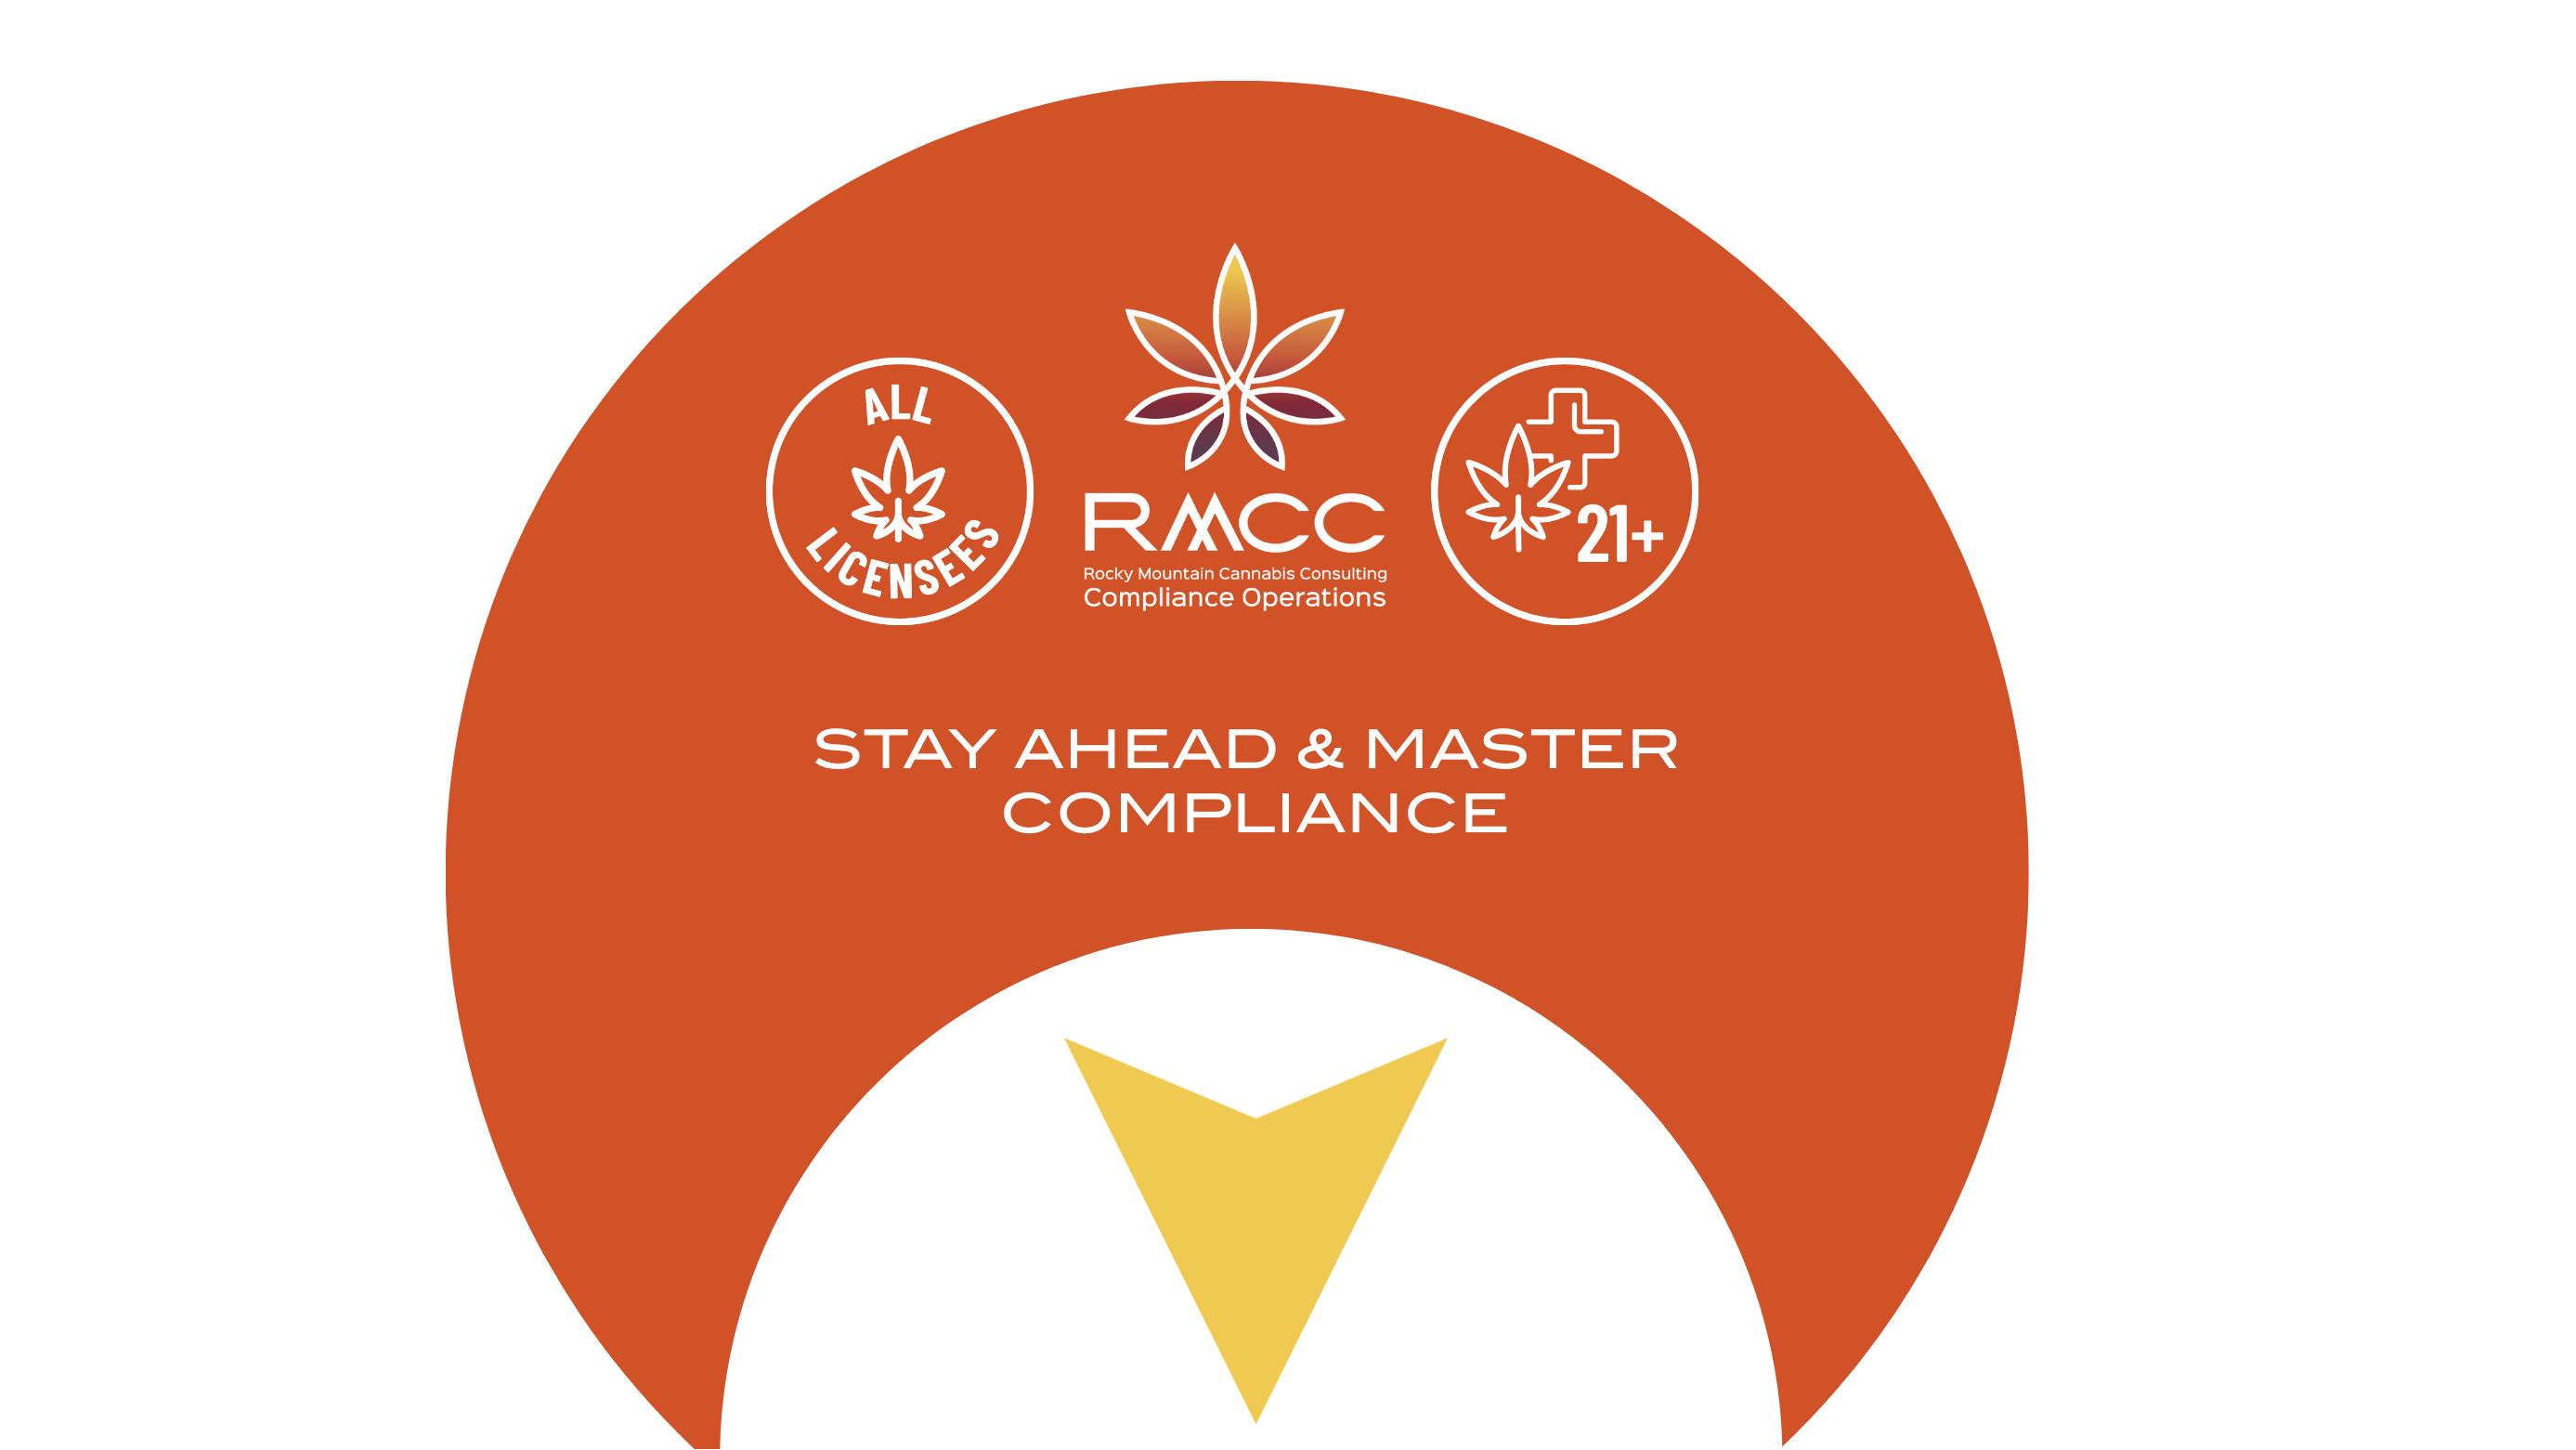 Stay Ahead & Master Compliance RMCC METRC tickets, METRC training, Oklahoma cannabis, Maine Cannabis, Oregon Cannabis, coronavirus, cannabis certification